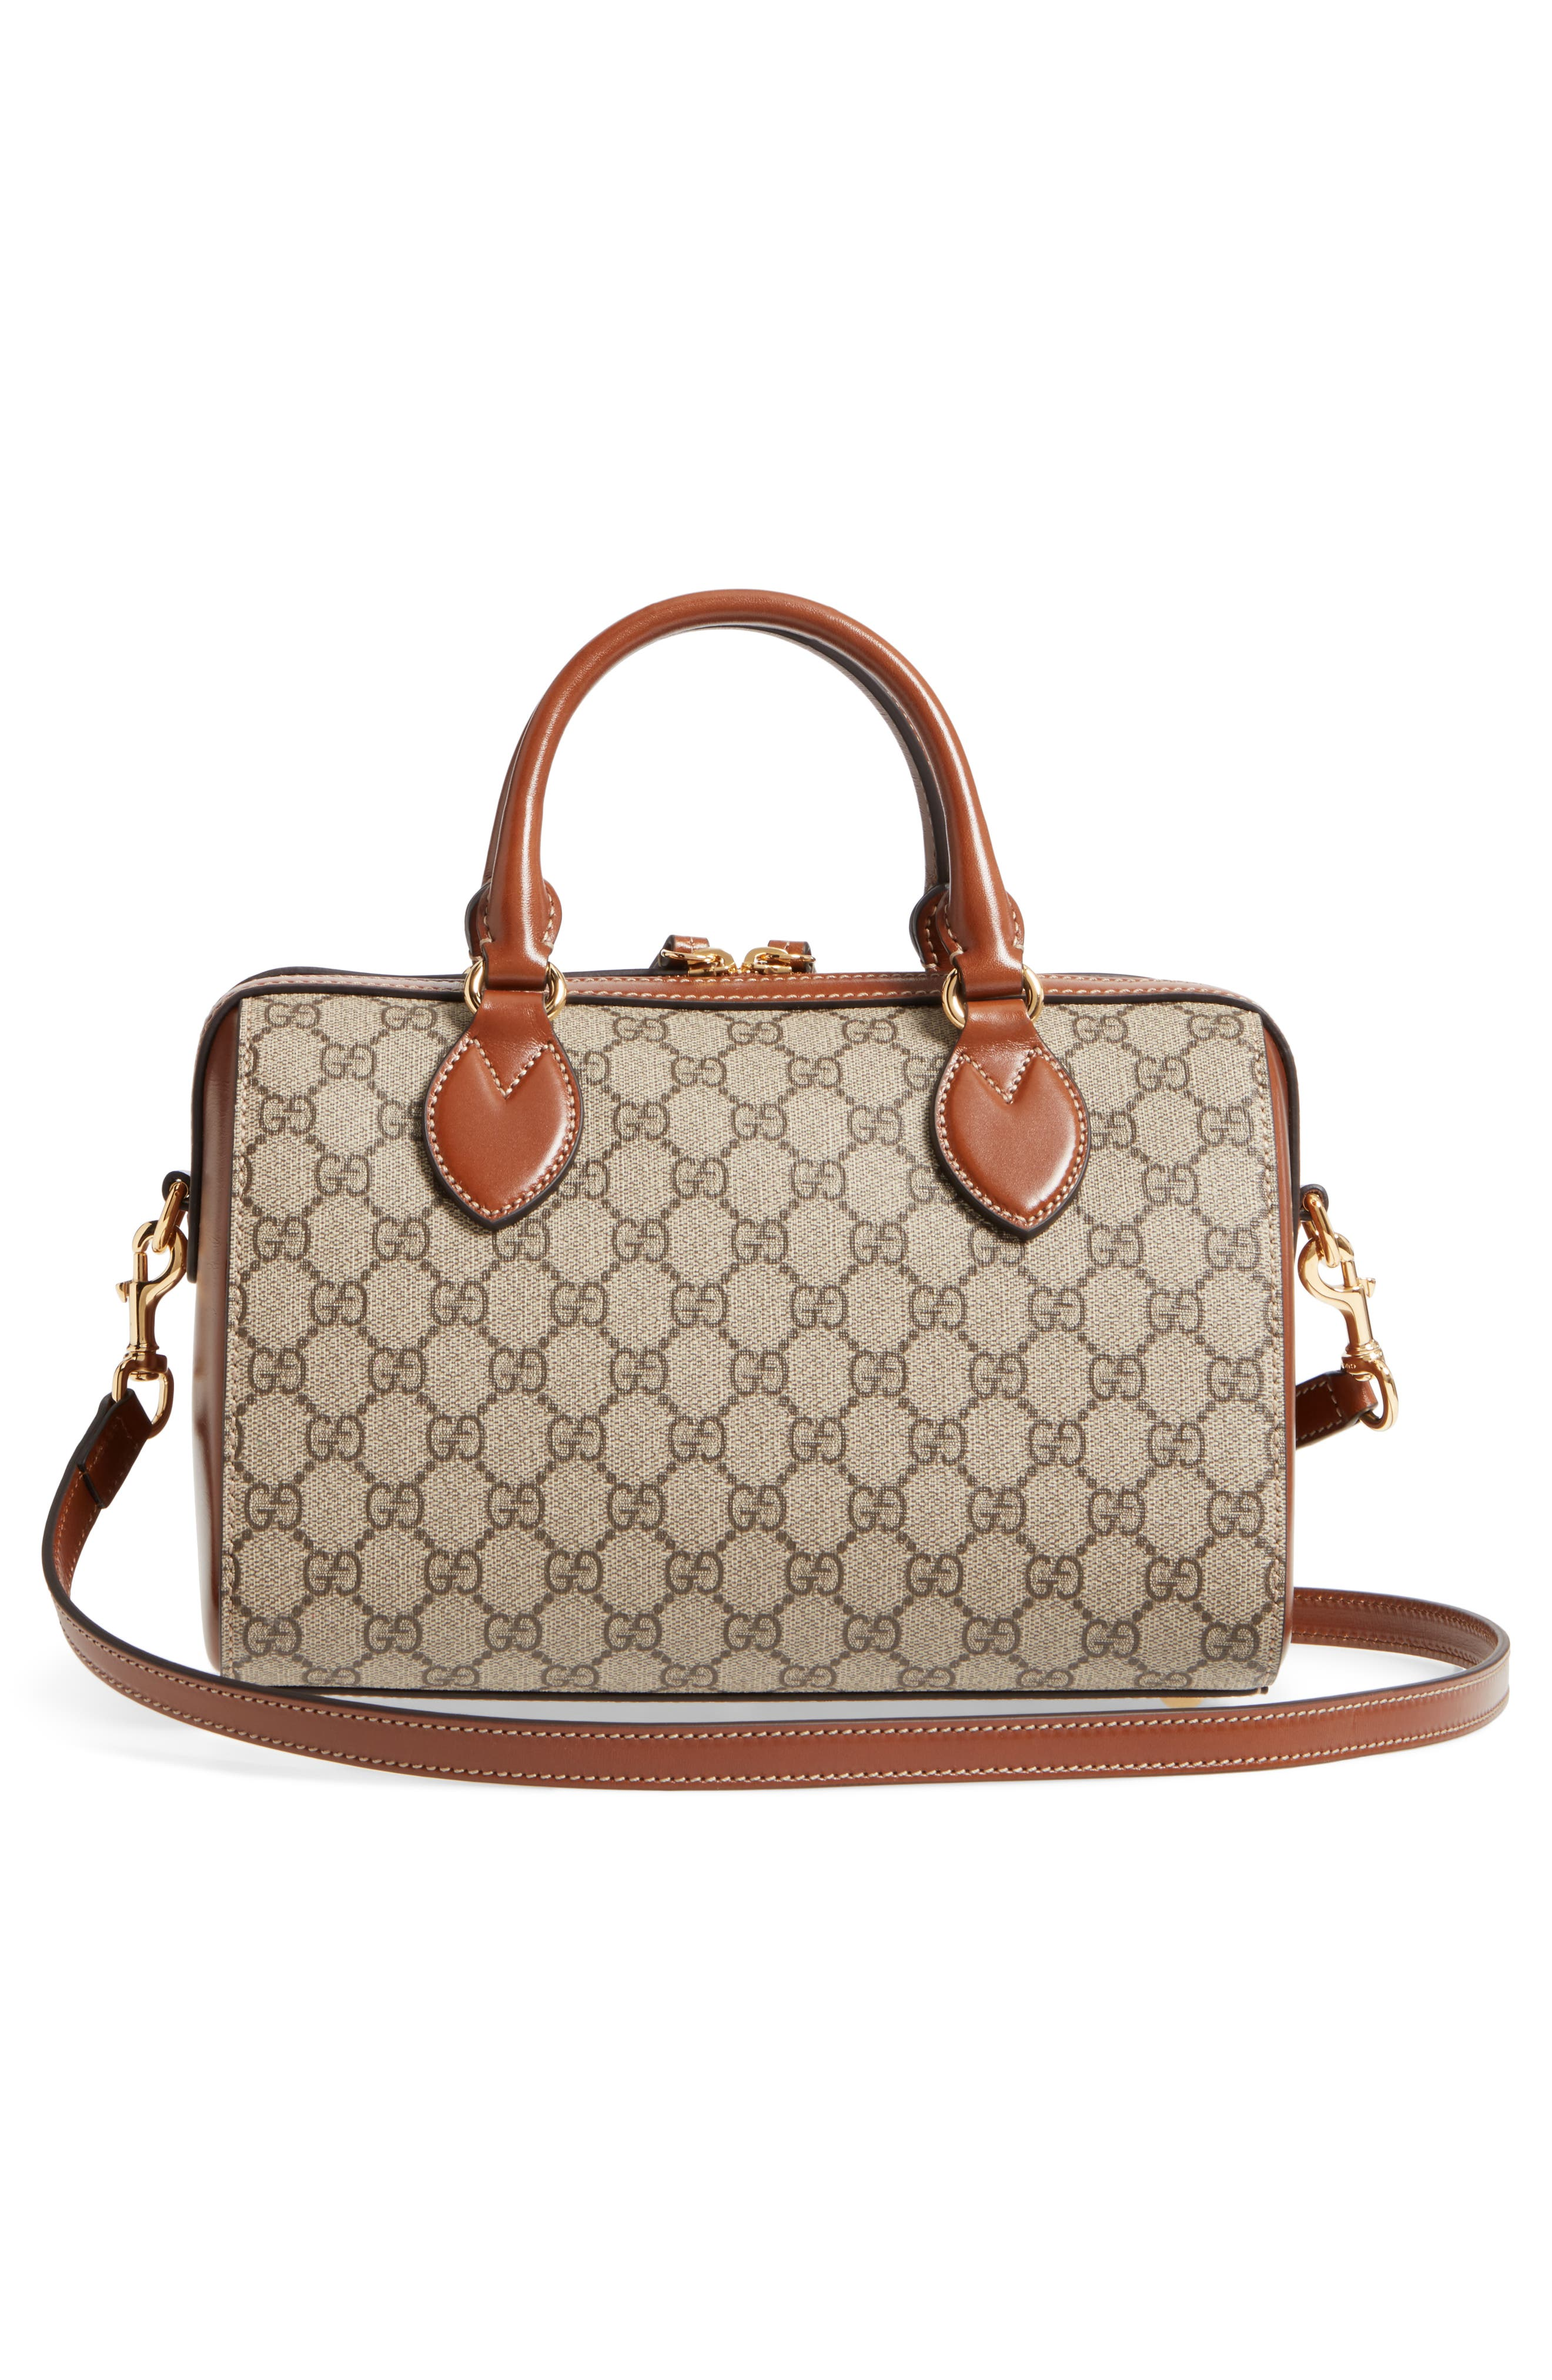 Linea Top Handle GG Supreme Canvas & Leather Bag,                             Alternate thumbnail 3, color,                             Beige/ Ebony/ Cuir